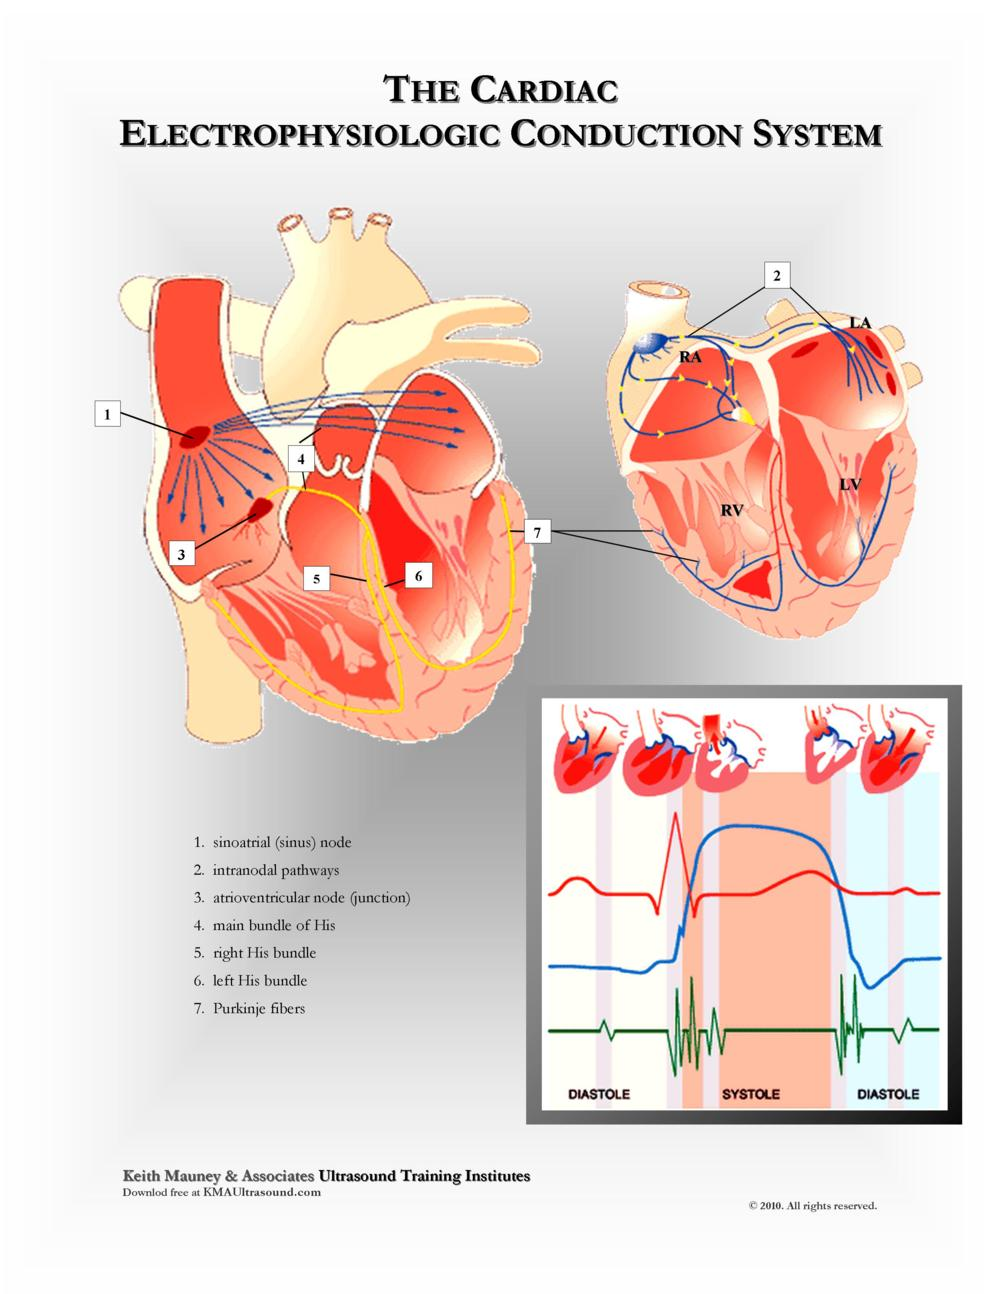 KMA Ultrasound Cardiac Electrophysiologic Conduction System